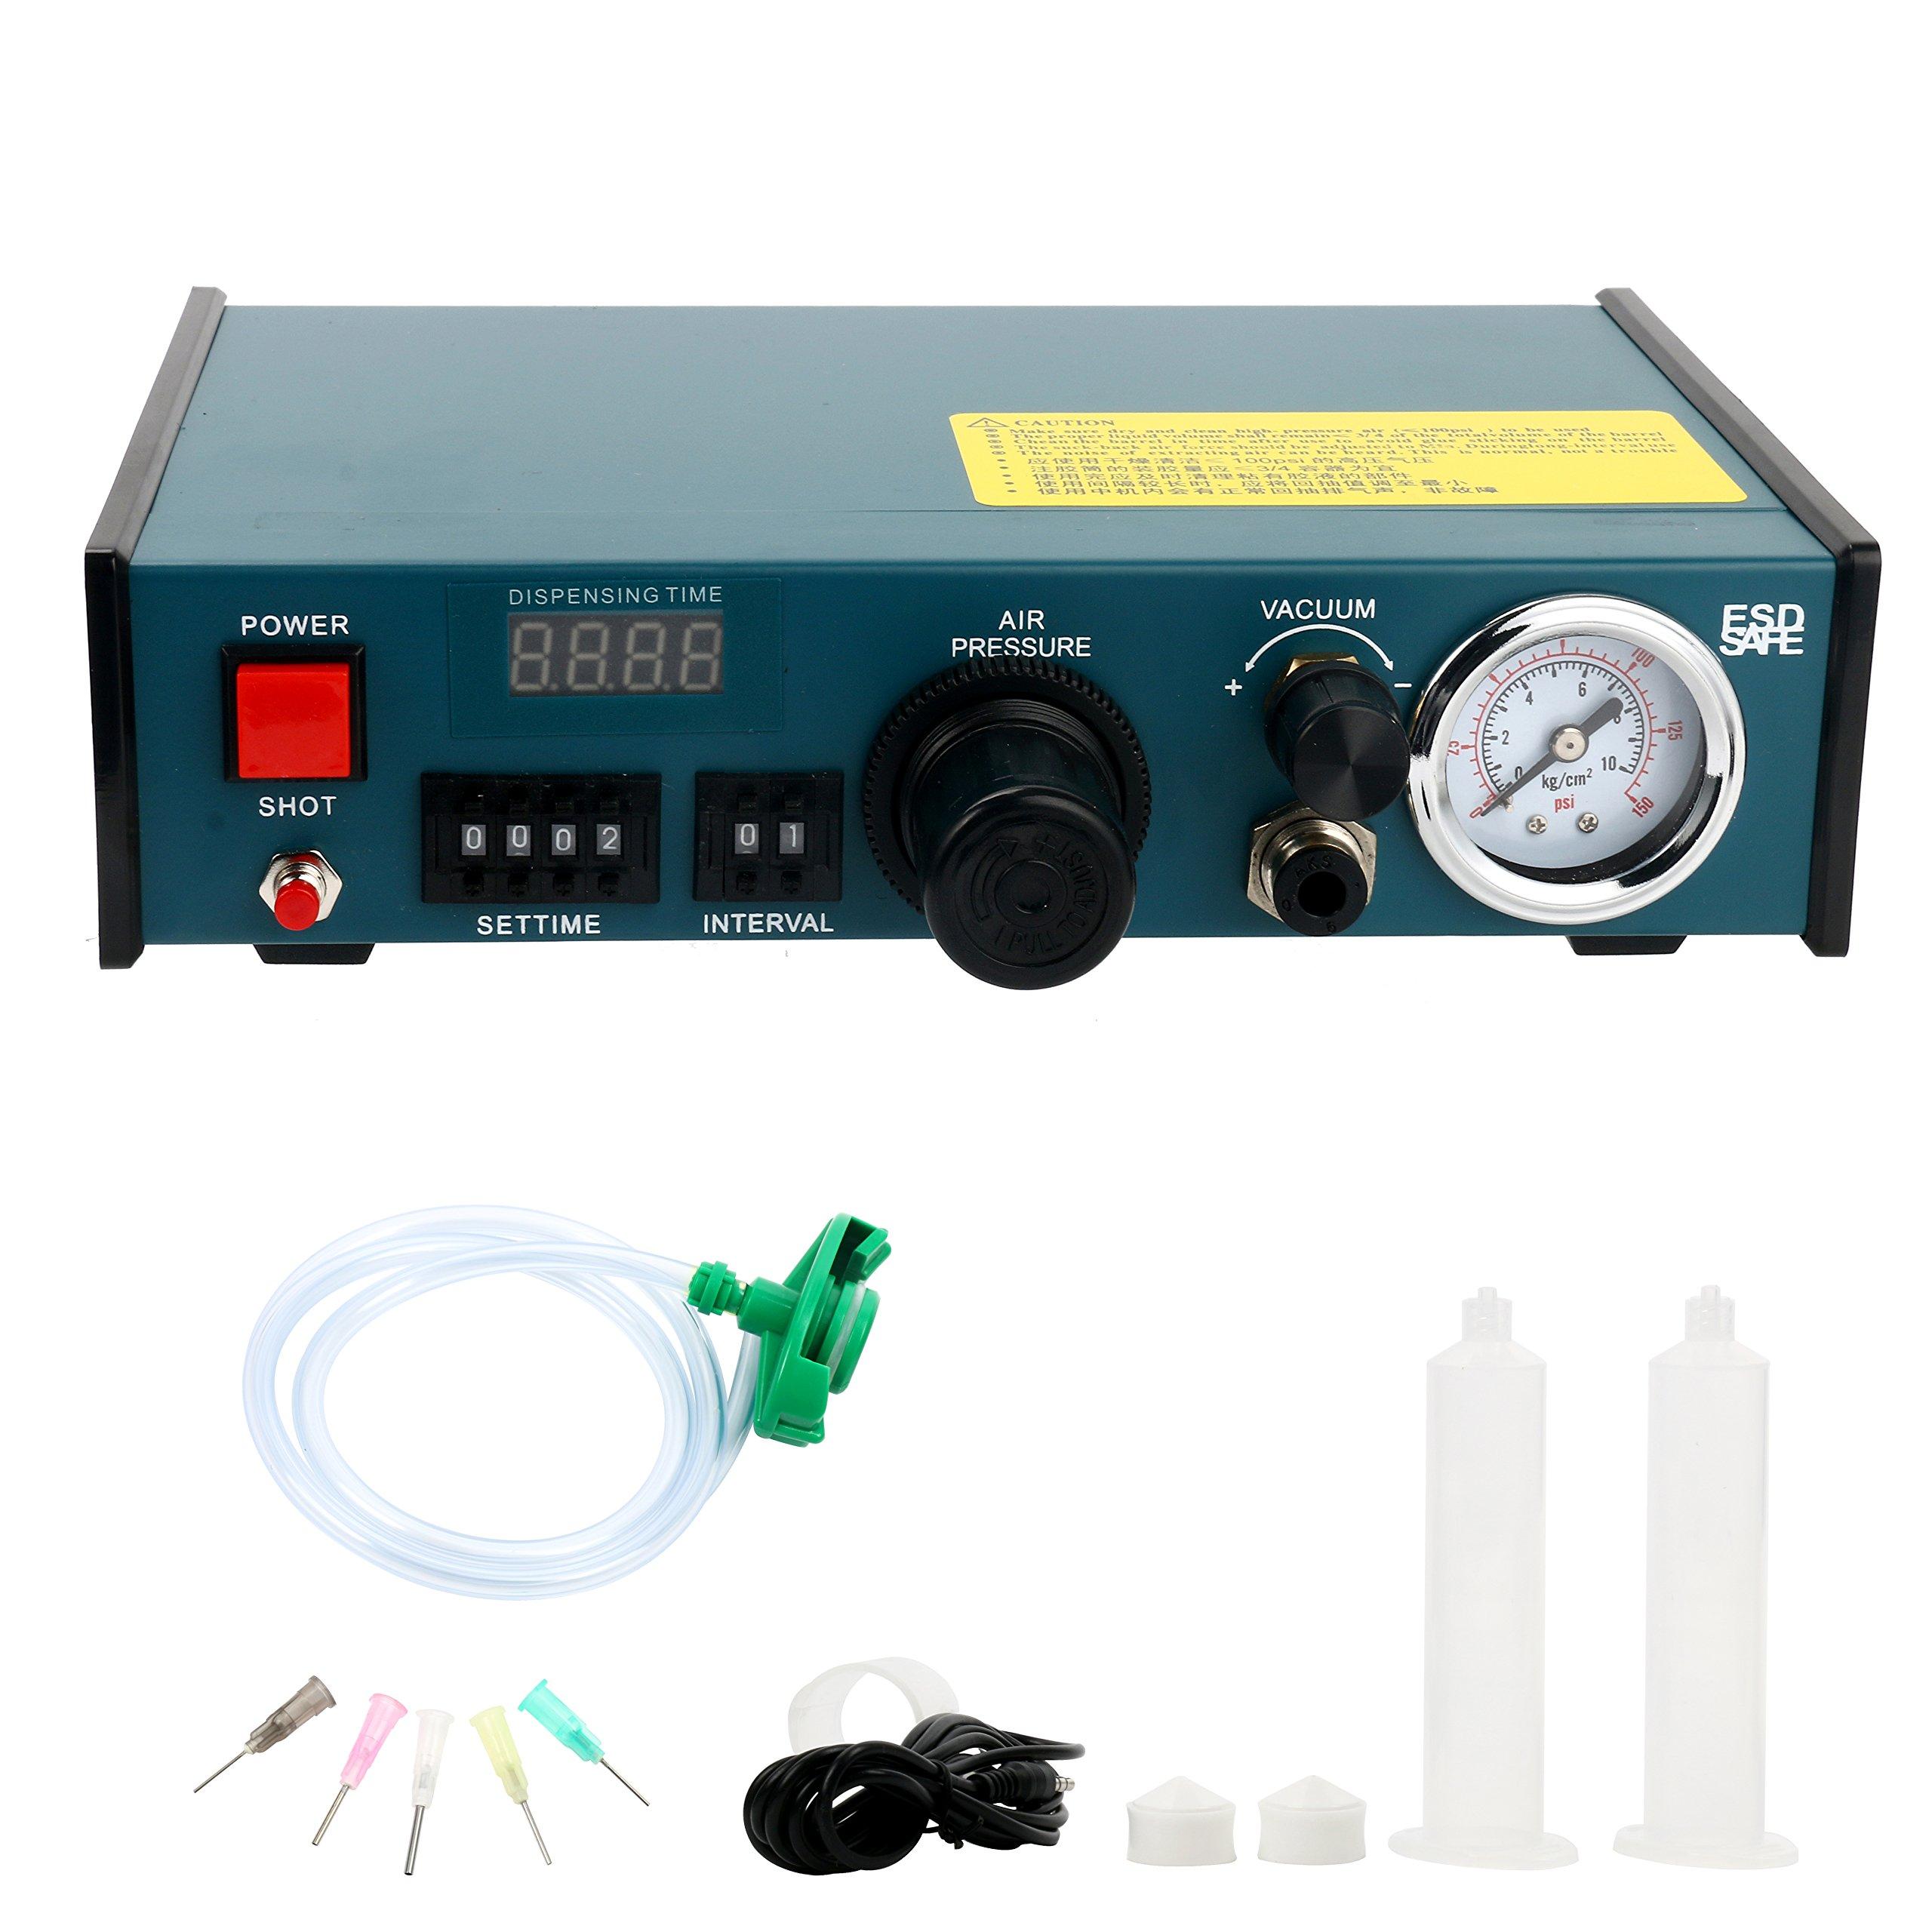 Digital Display Auto Glue Dispenser Solder Paste Liquid Controller Dropper 983A by YaeCCC (Image #5)